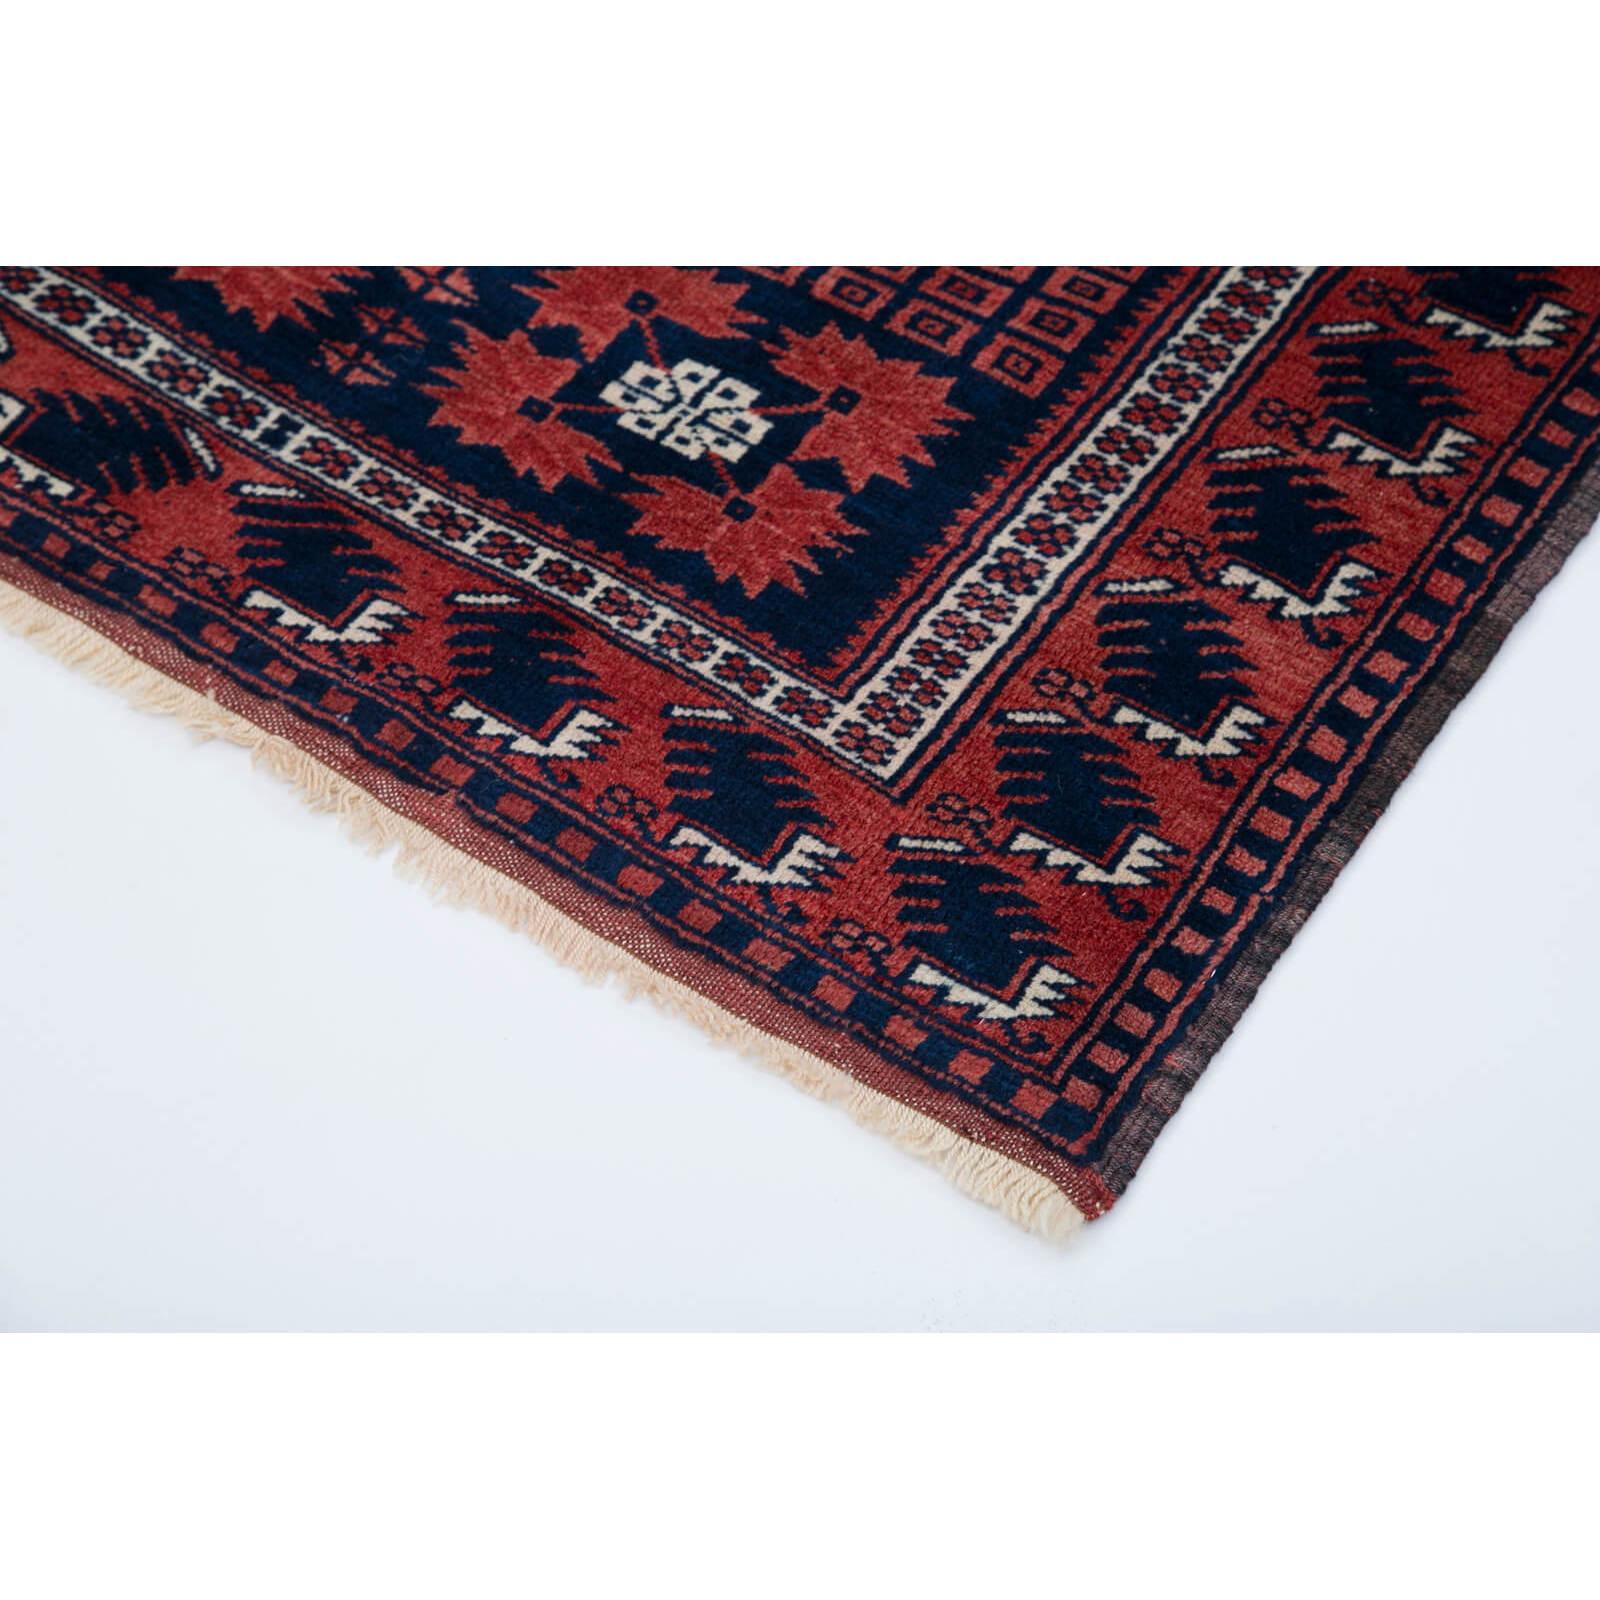 103x160 Cm Blue Handmade Anatolian Rug-3x5 Ft